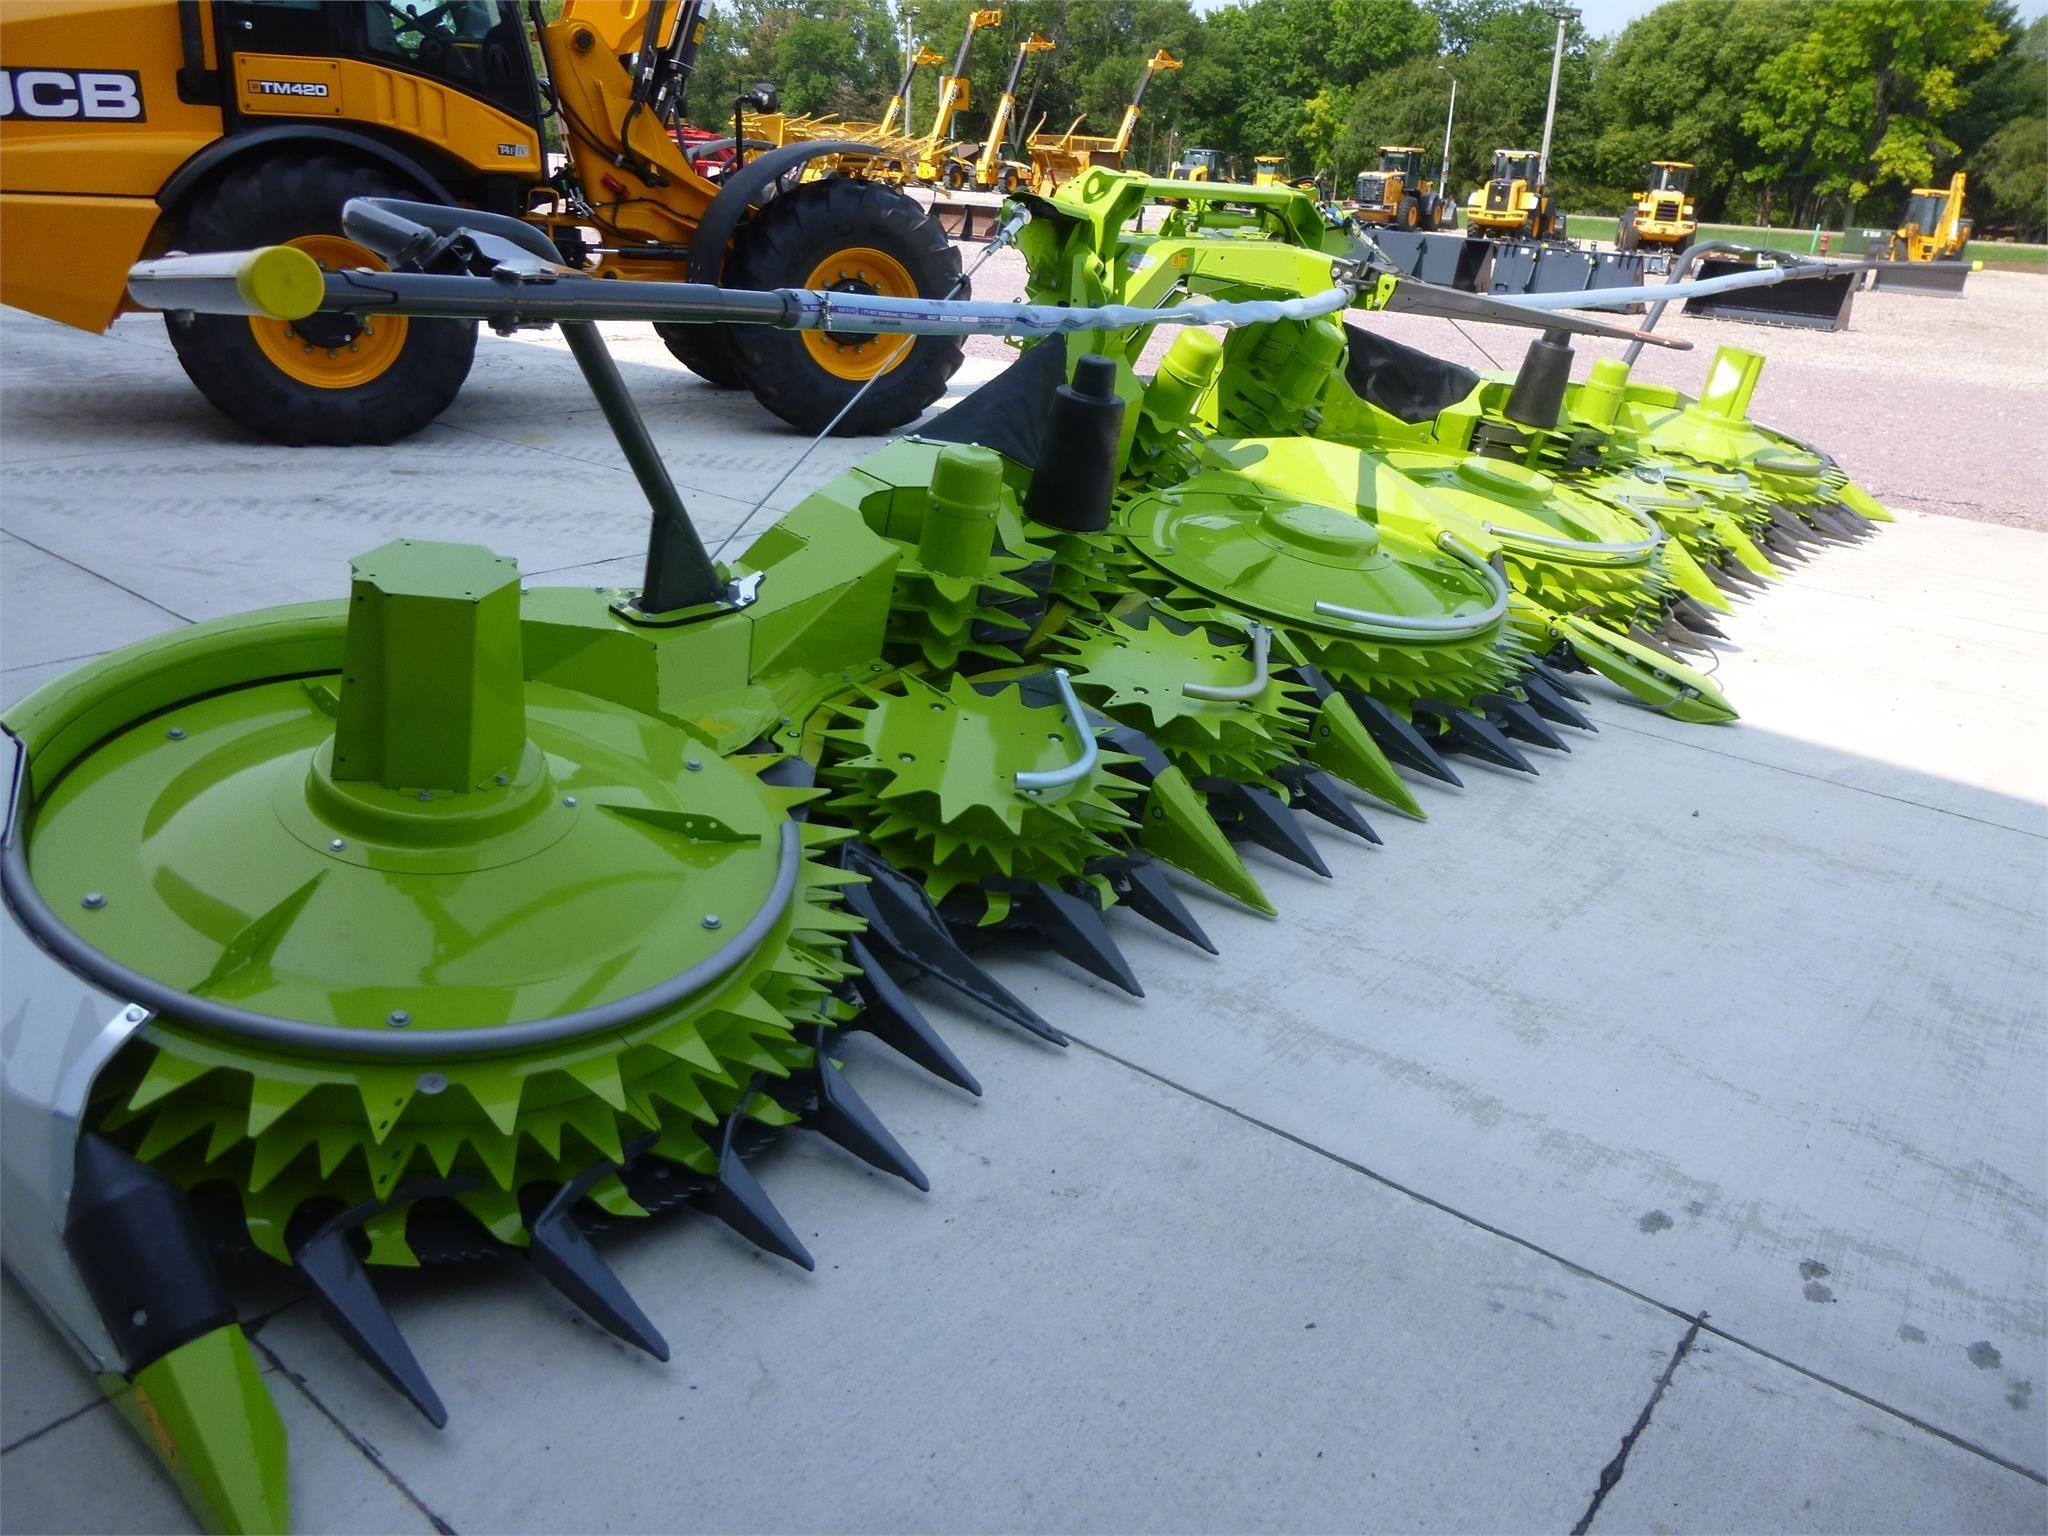 2021 Claas ORBIS 900 Forage Harvester Head